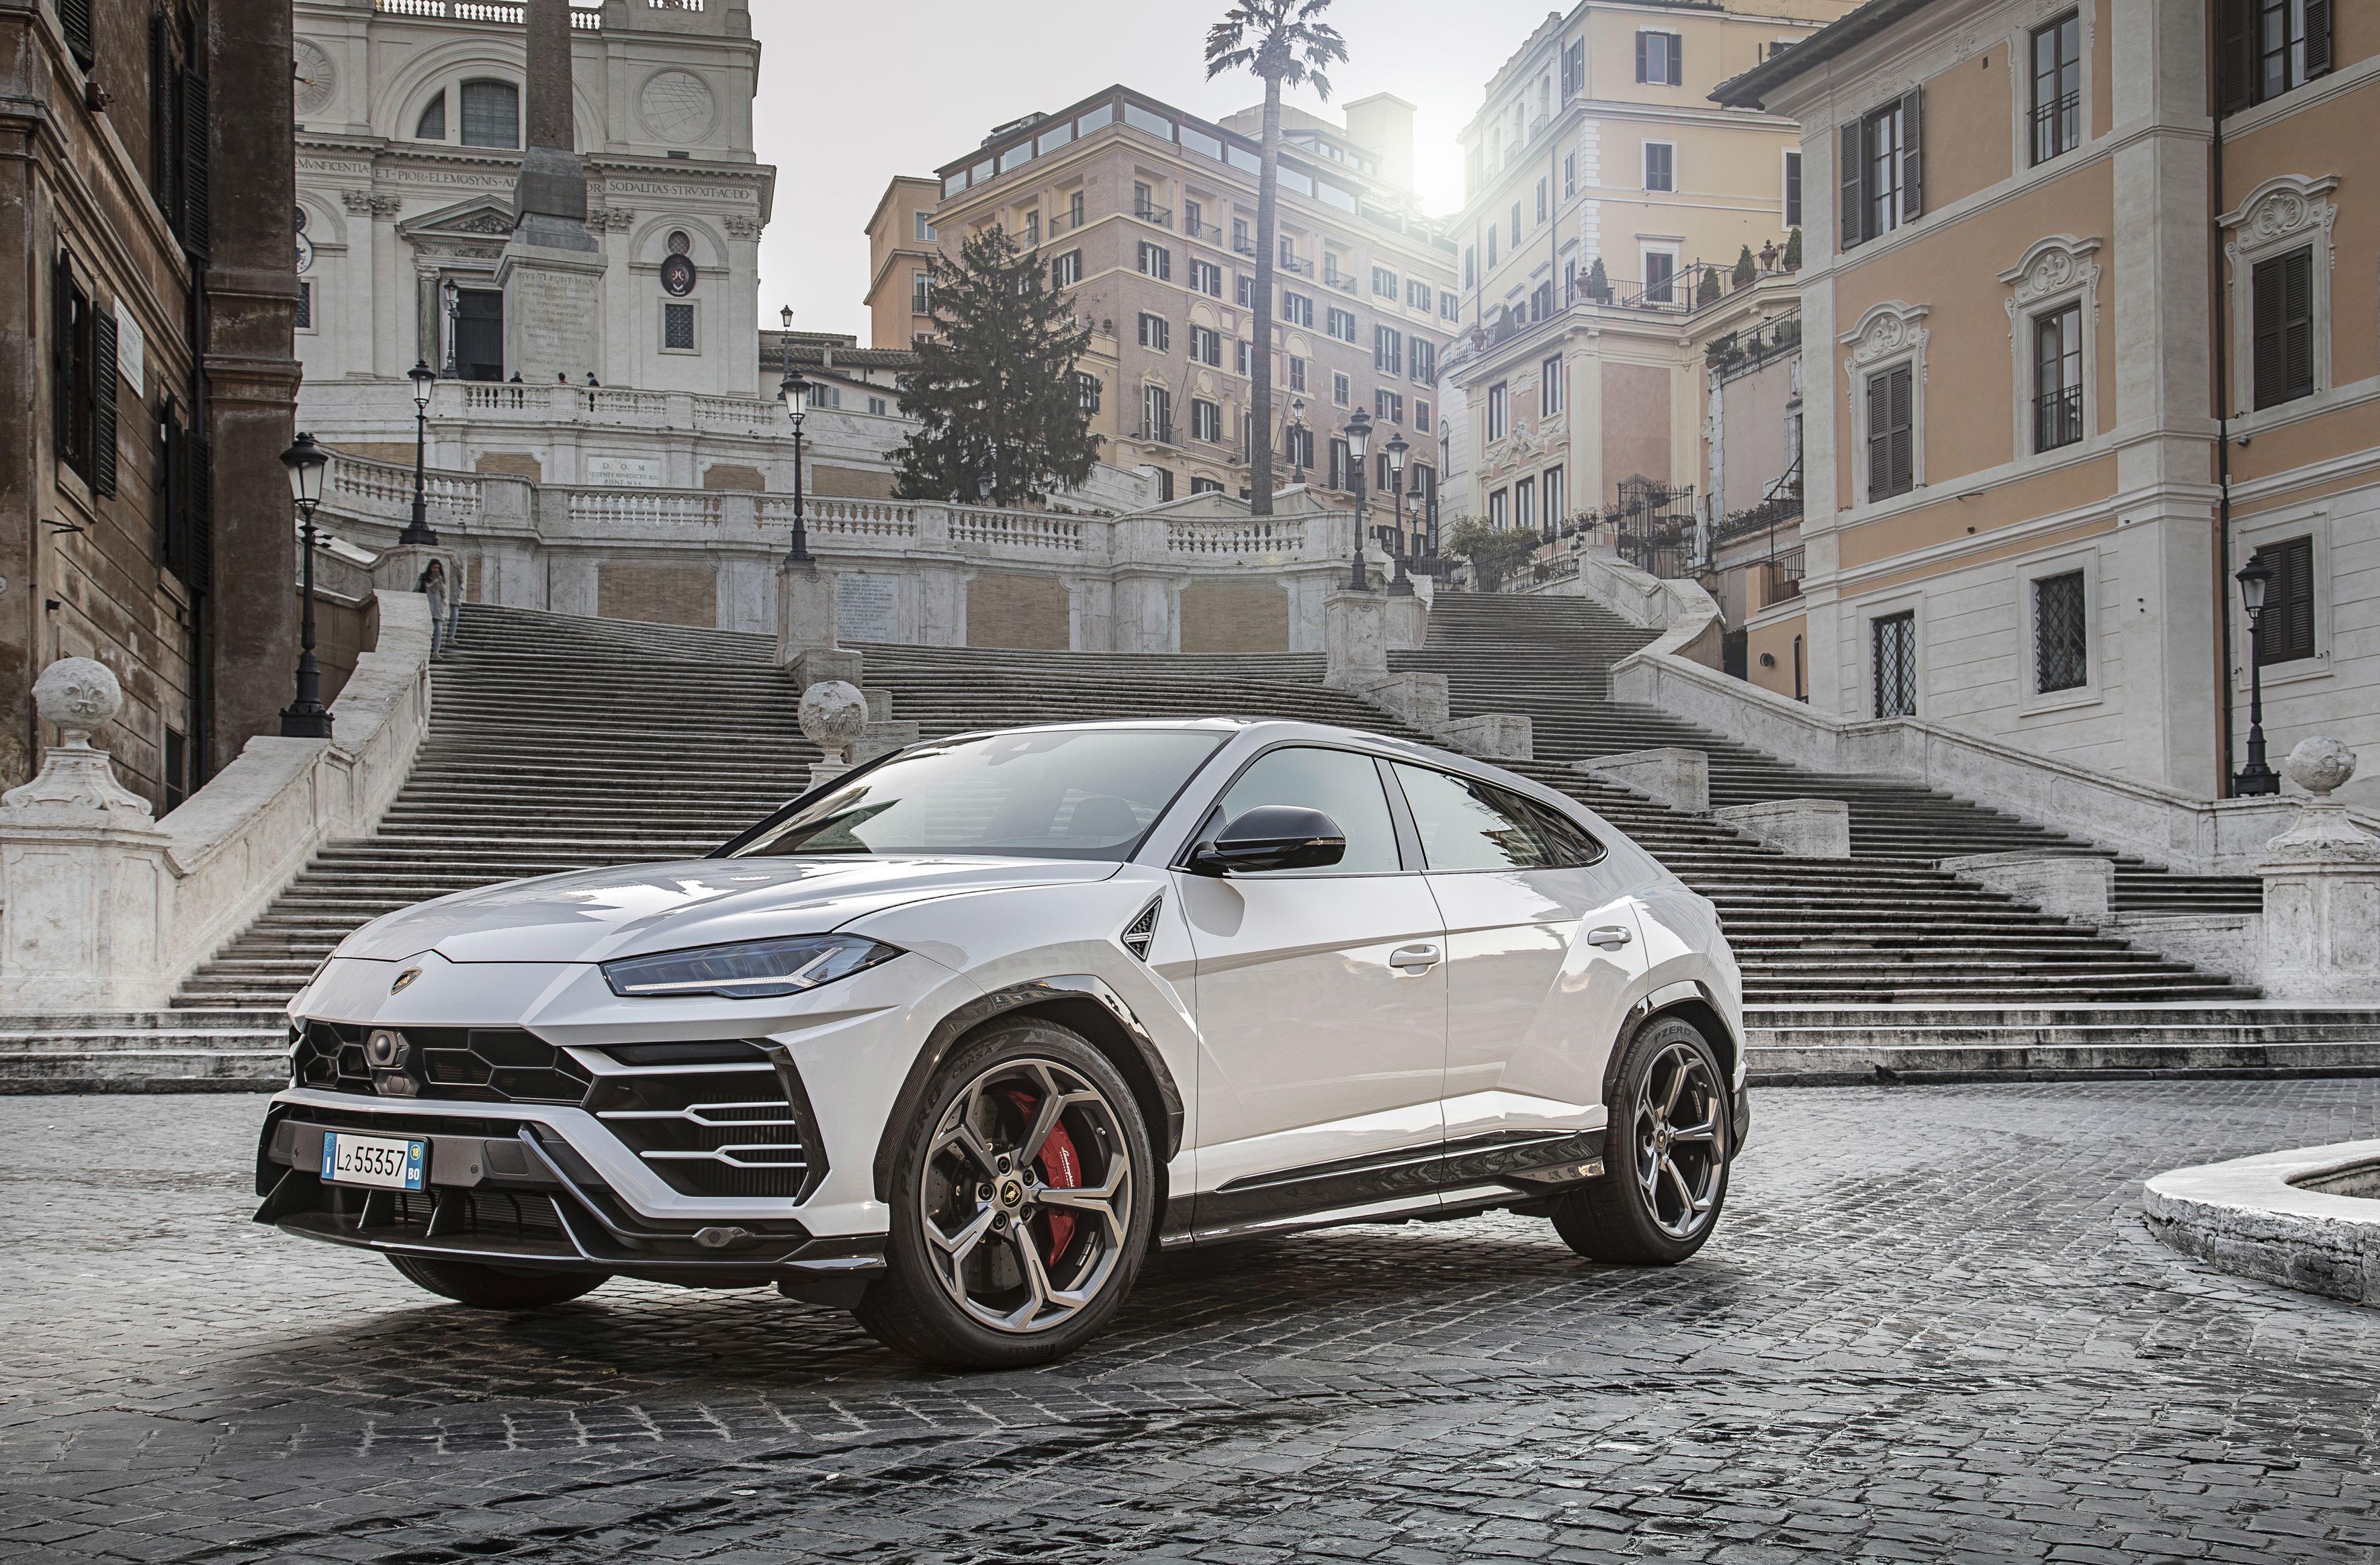 Lamborghini Vehicles Reviews, Pricing, and Specs